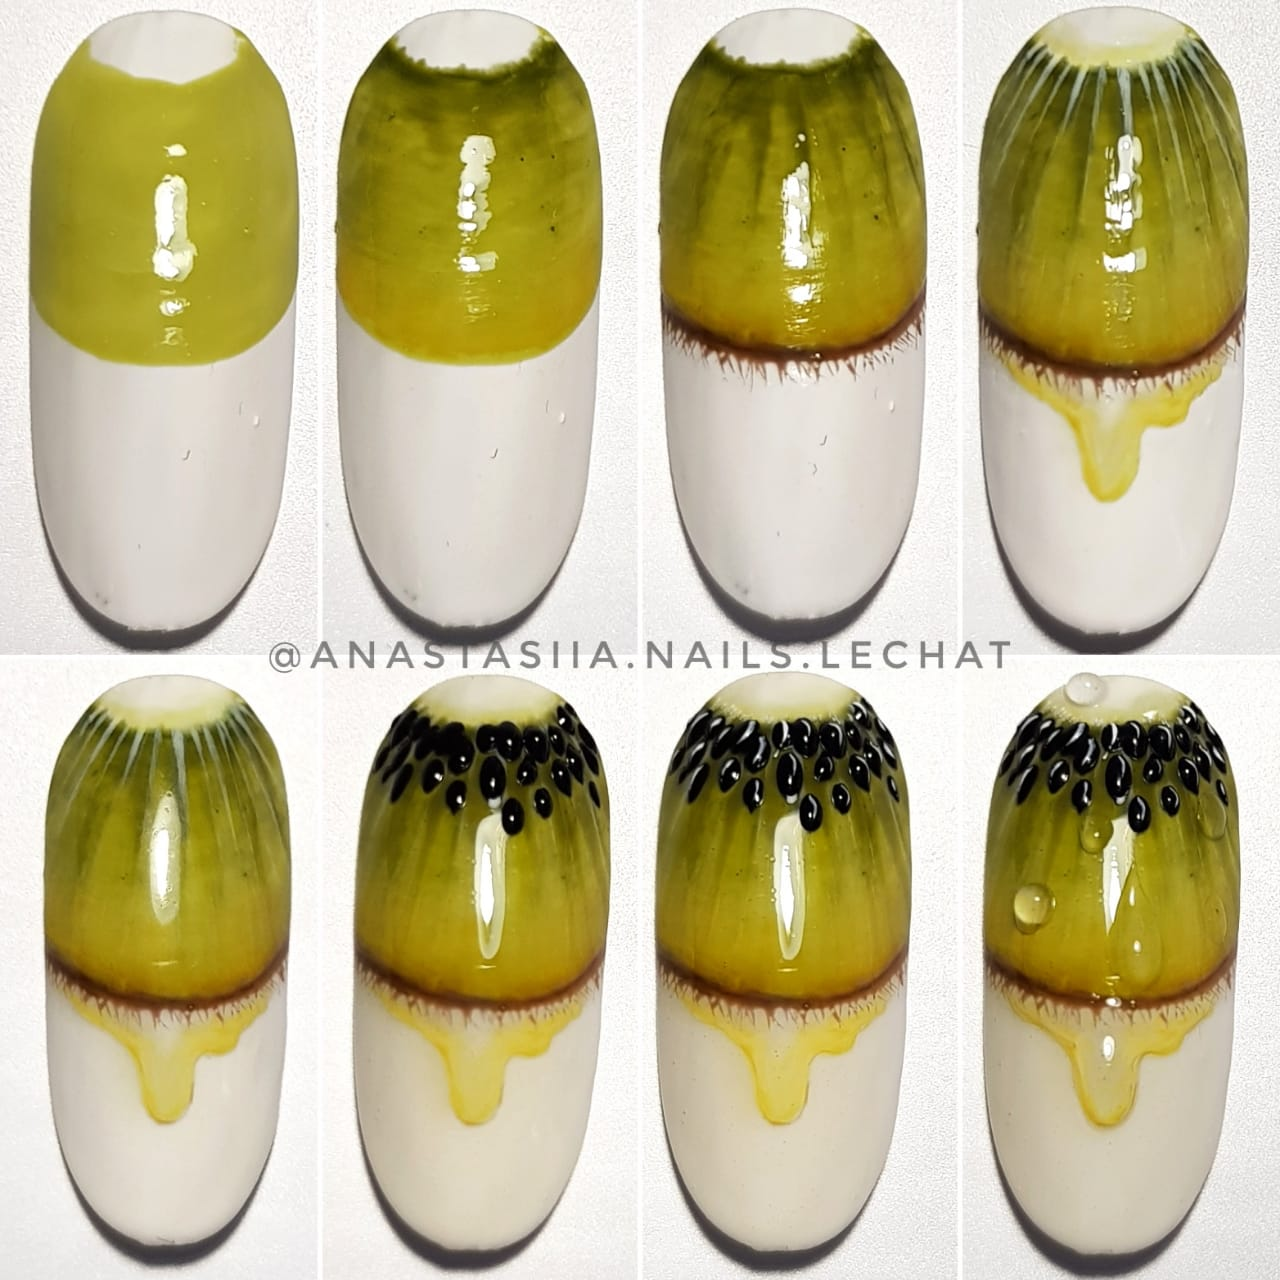 Kiwi design nail art